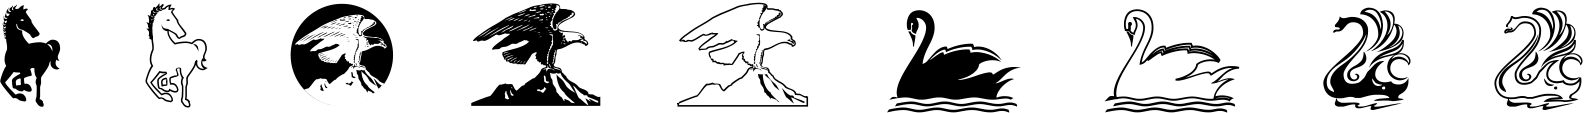 Polytype Images Three